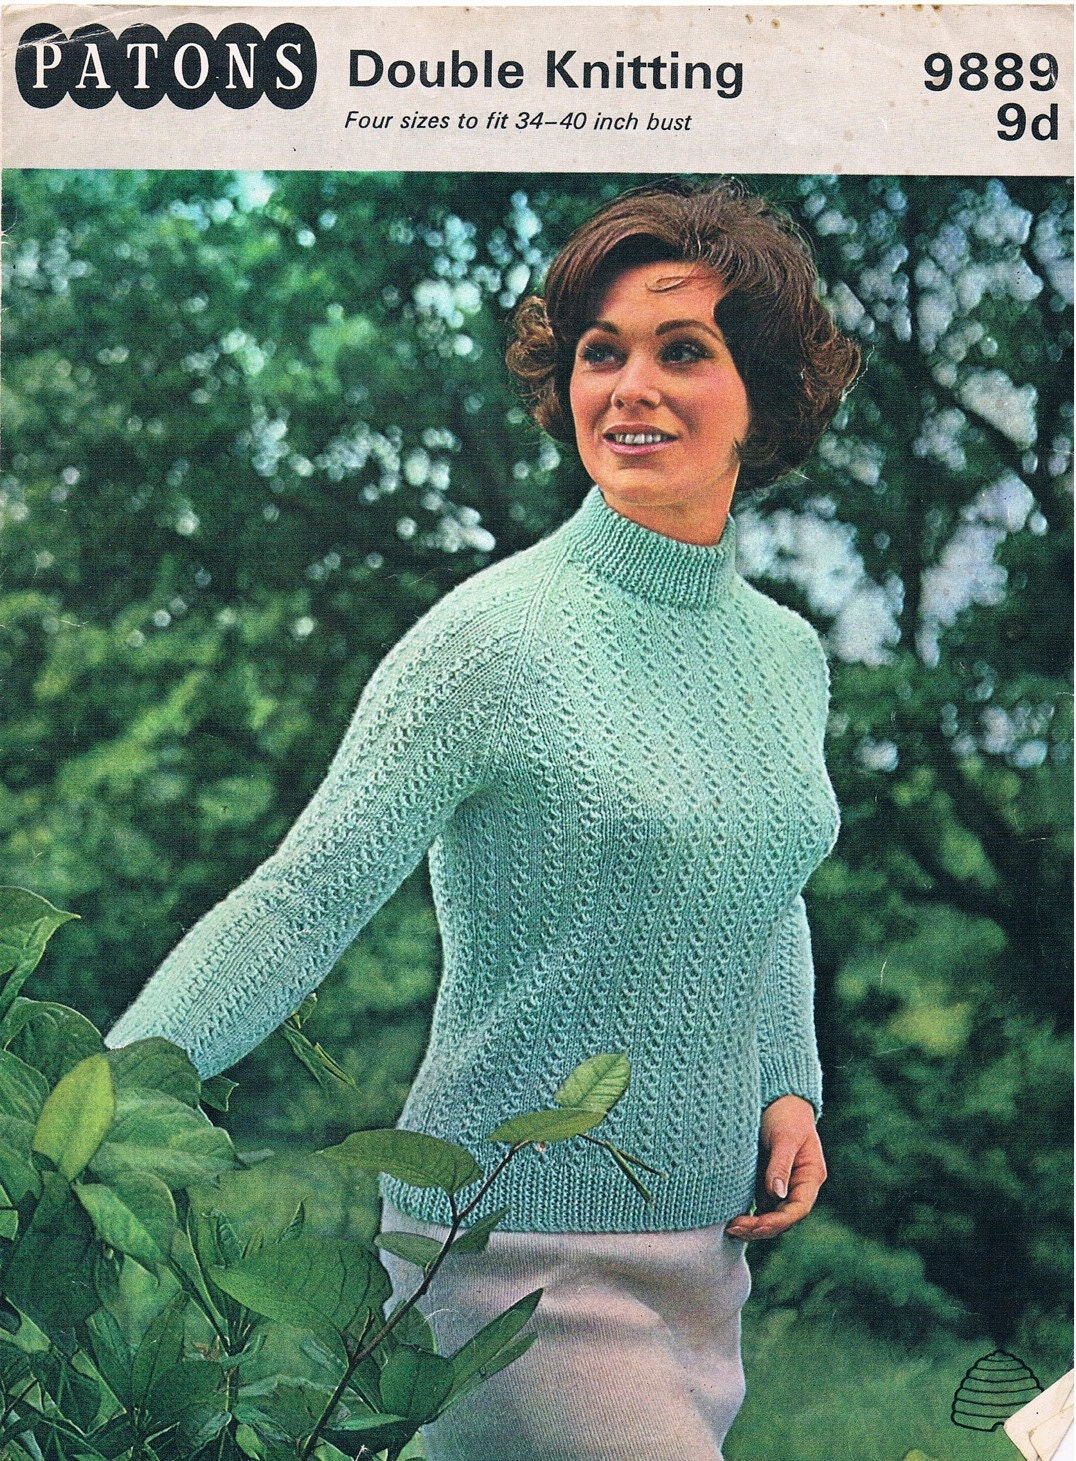 Girls Free Knitting Patterns : Vintage Knitting Pattern PDF: 1960s Patons Double Knitting